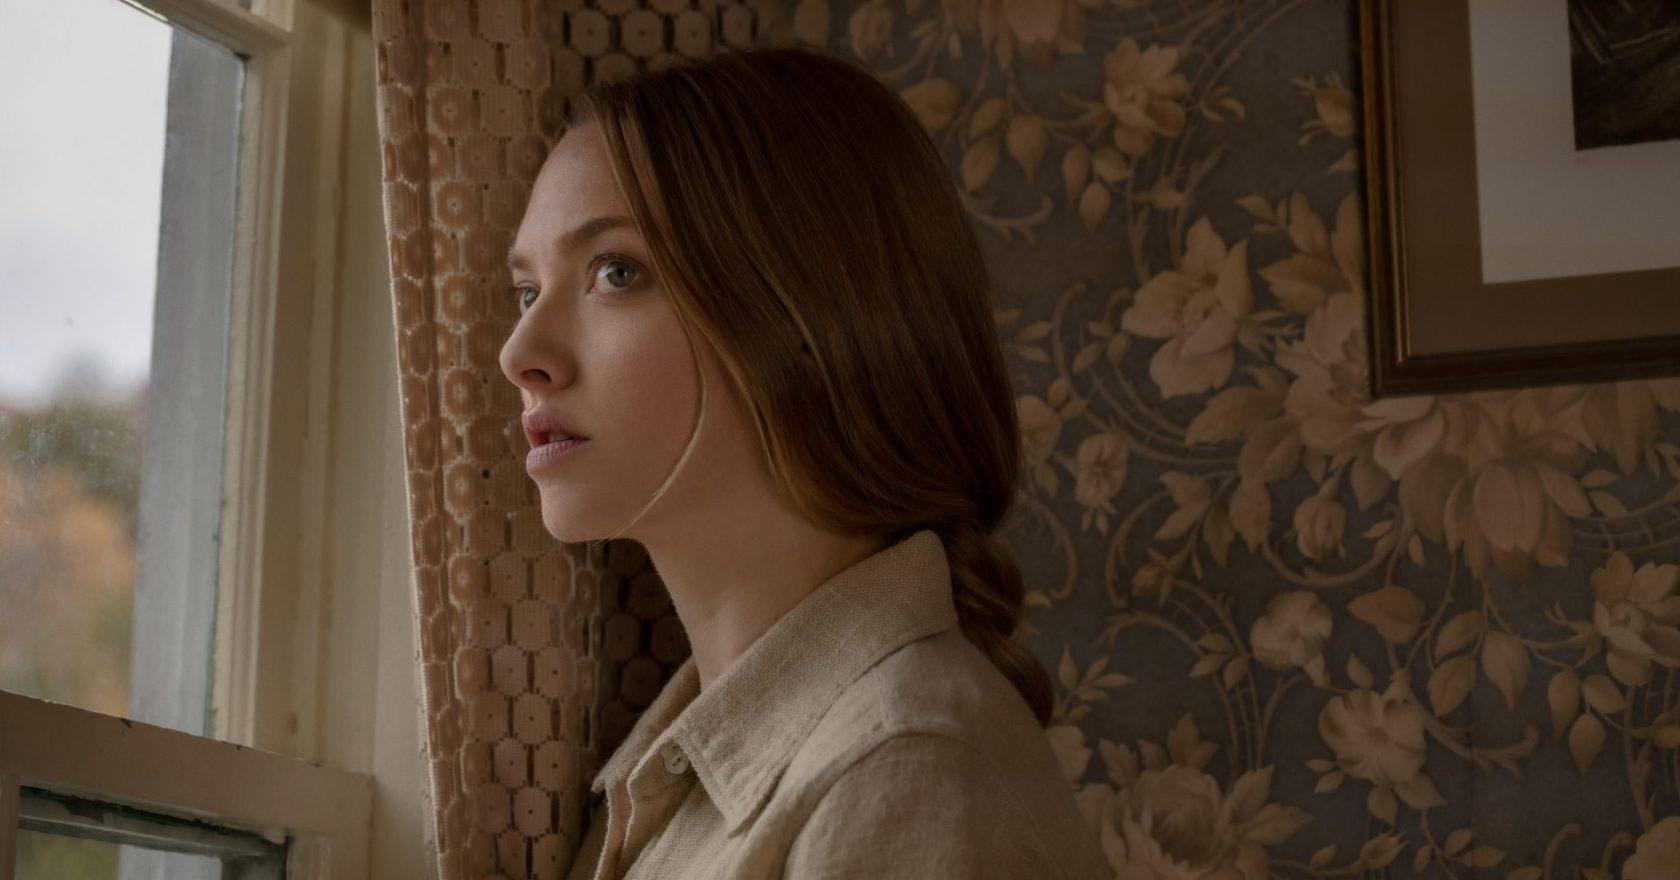 Love a sinister thriller? You'll adore Amanda Seyfried's new Netflix film